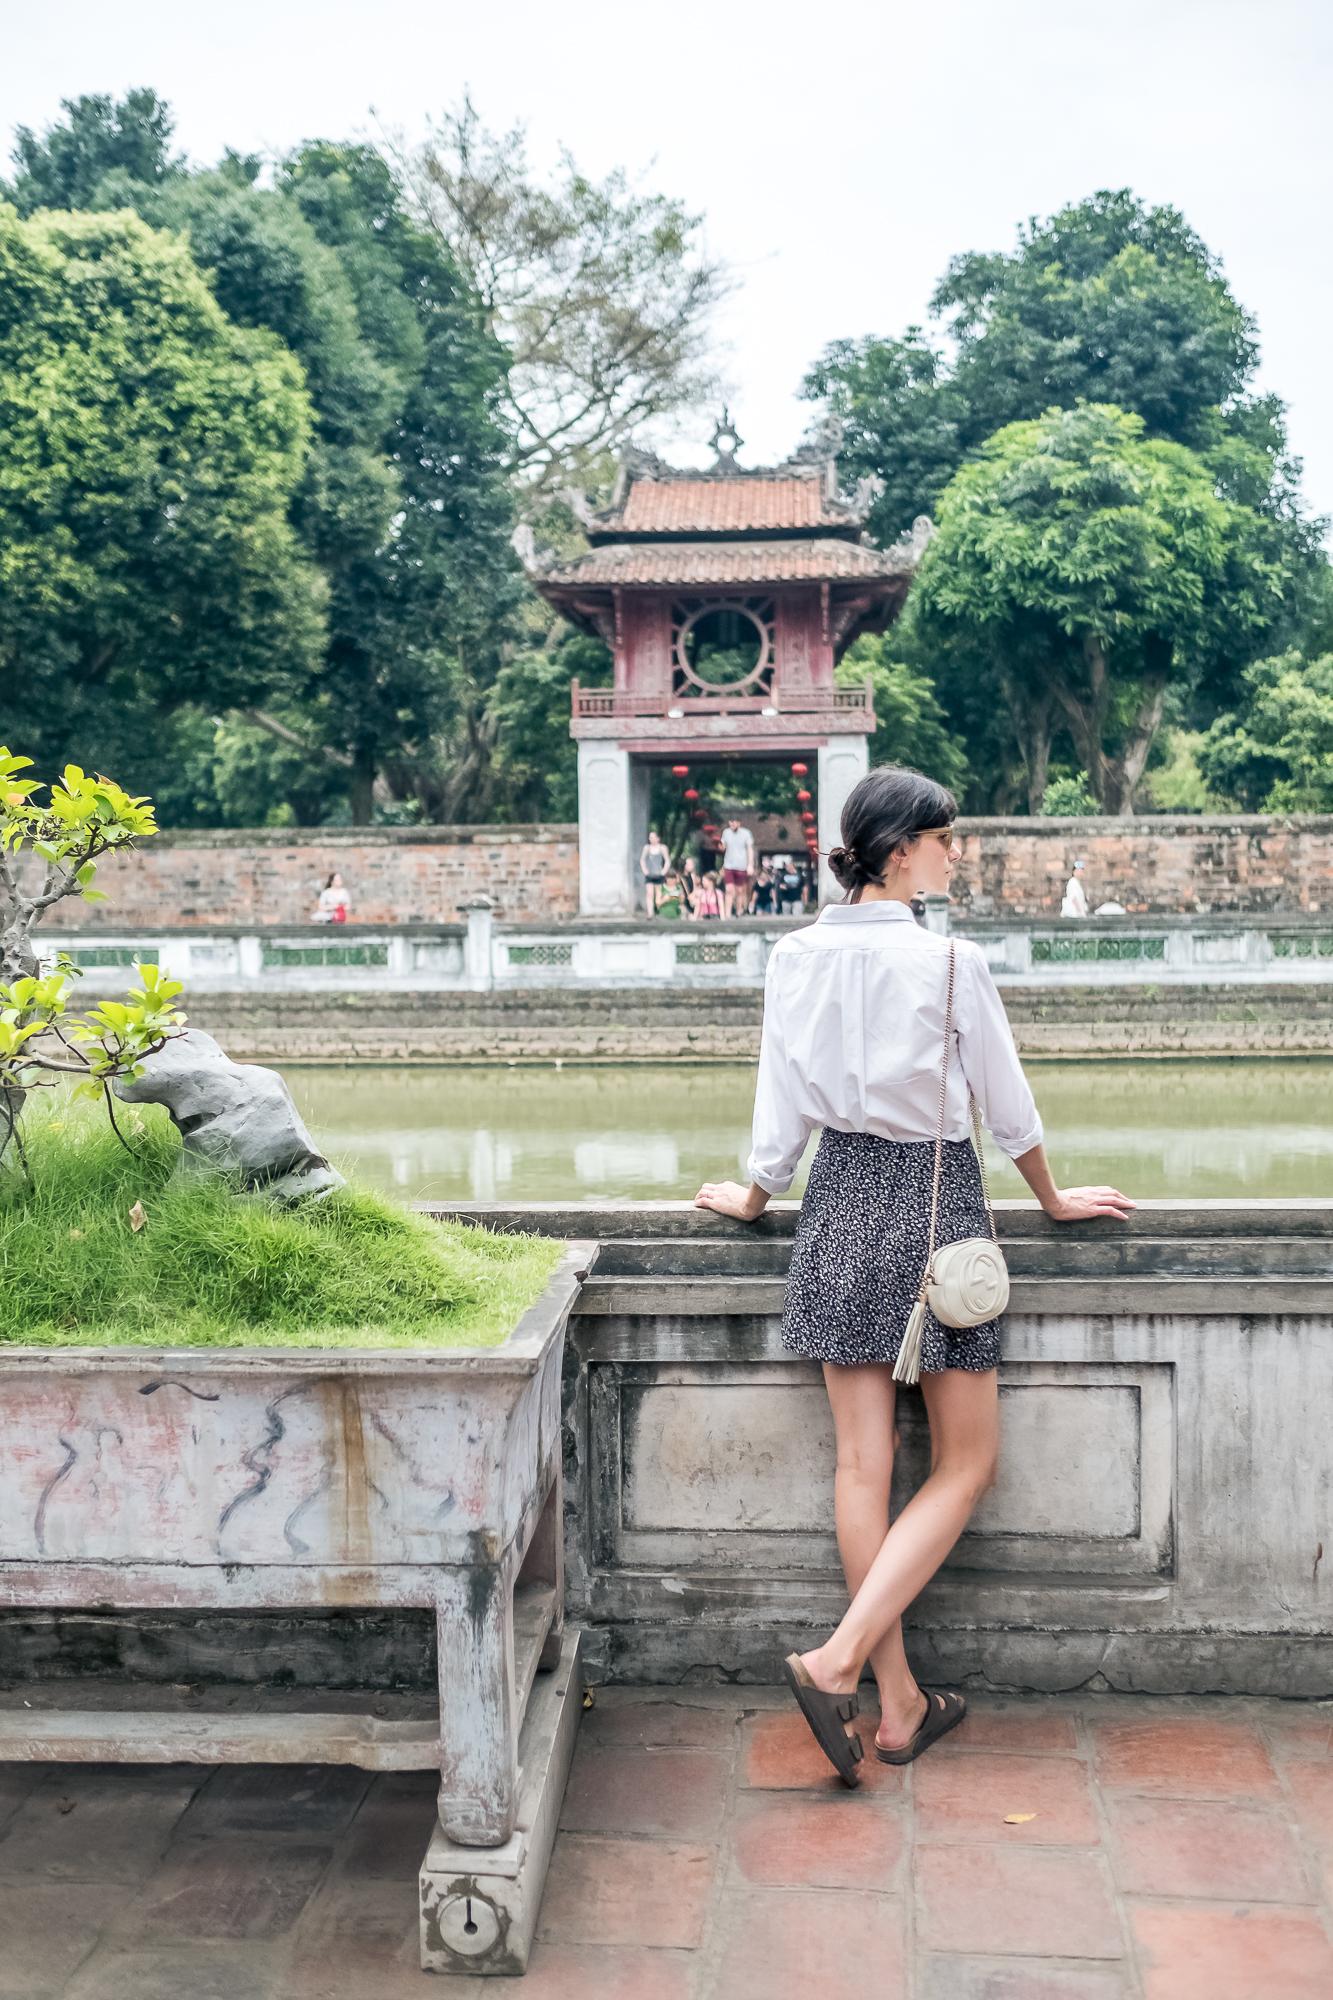 Vietnam_Honeymoon_TheOutsiderBlog_DSCF8012.JPG